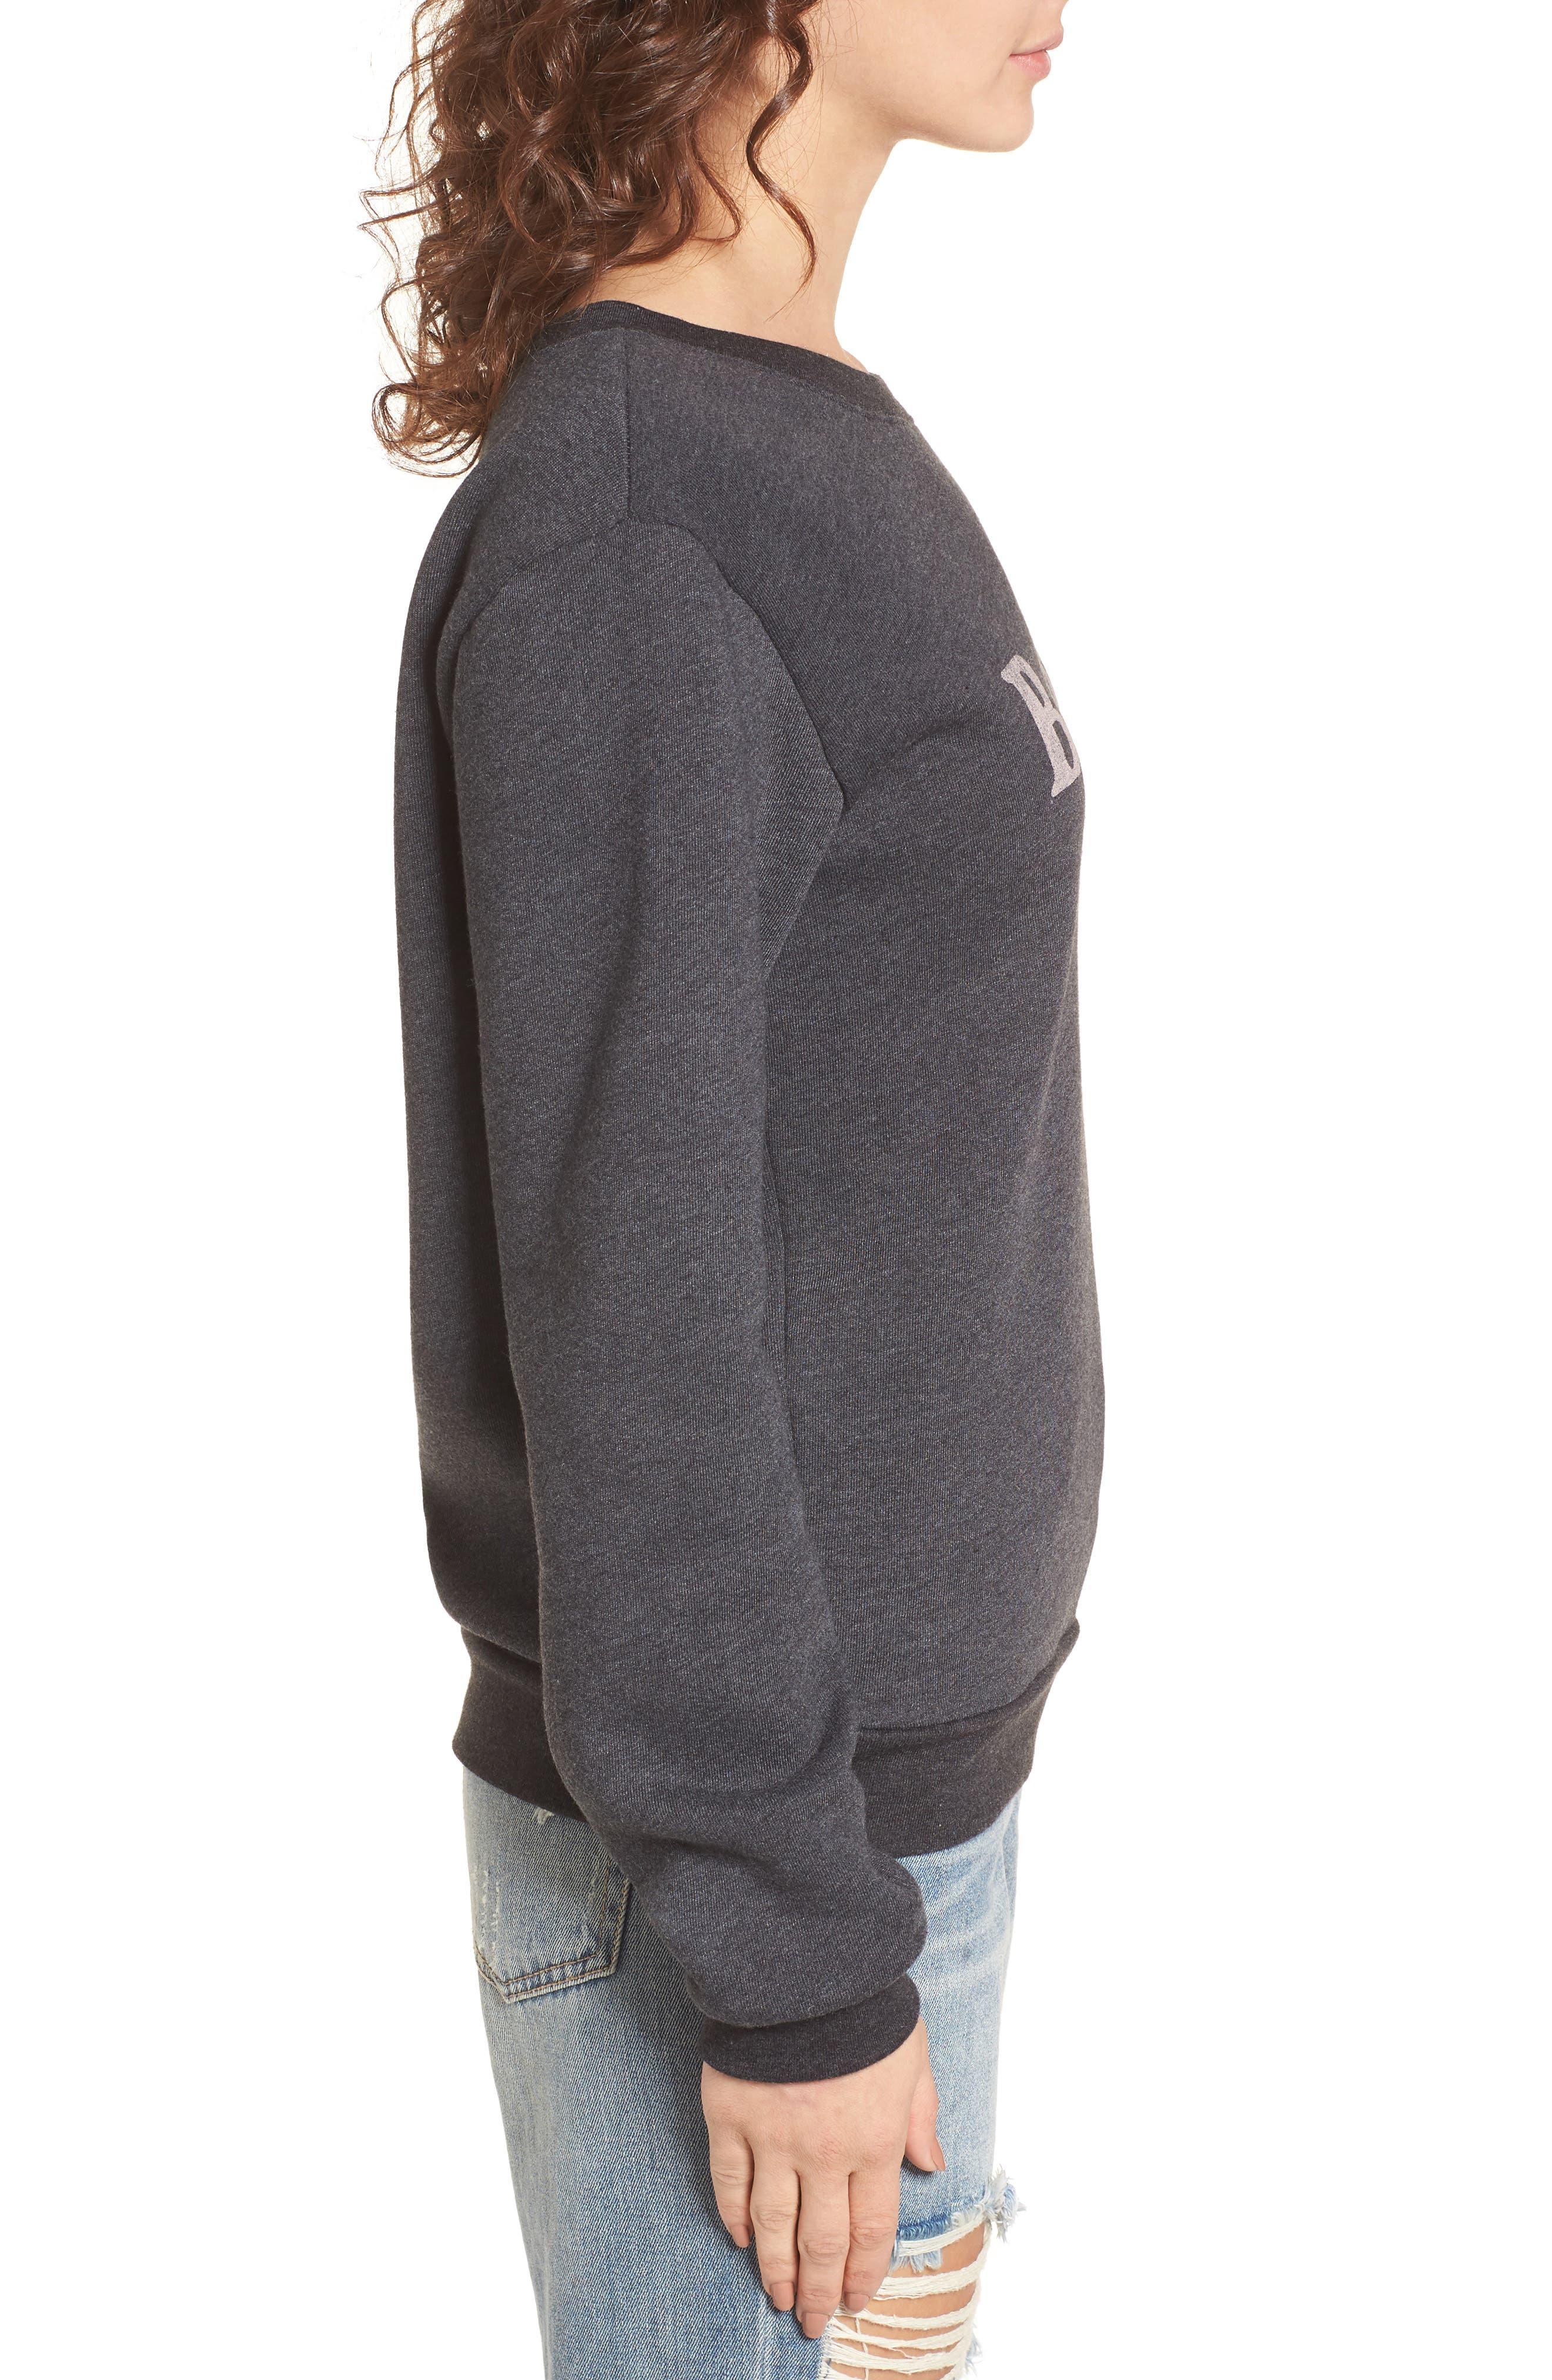 Bonjour Sweatshirt,                             Alternate thumbnail 3, color,                             Faded Black